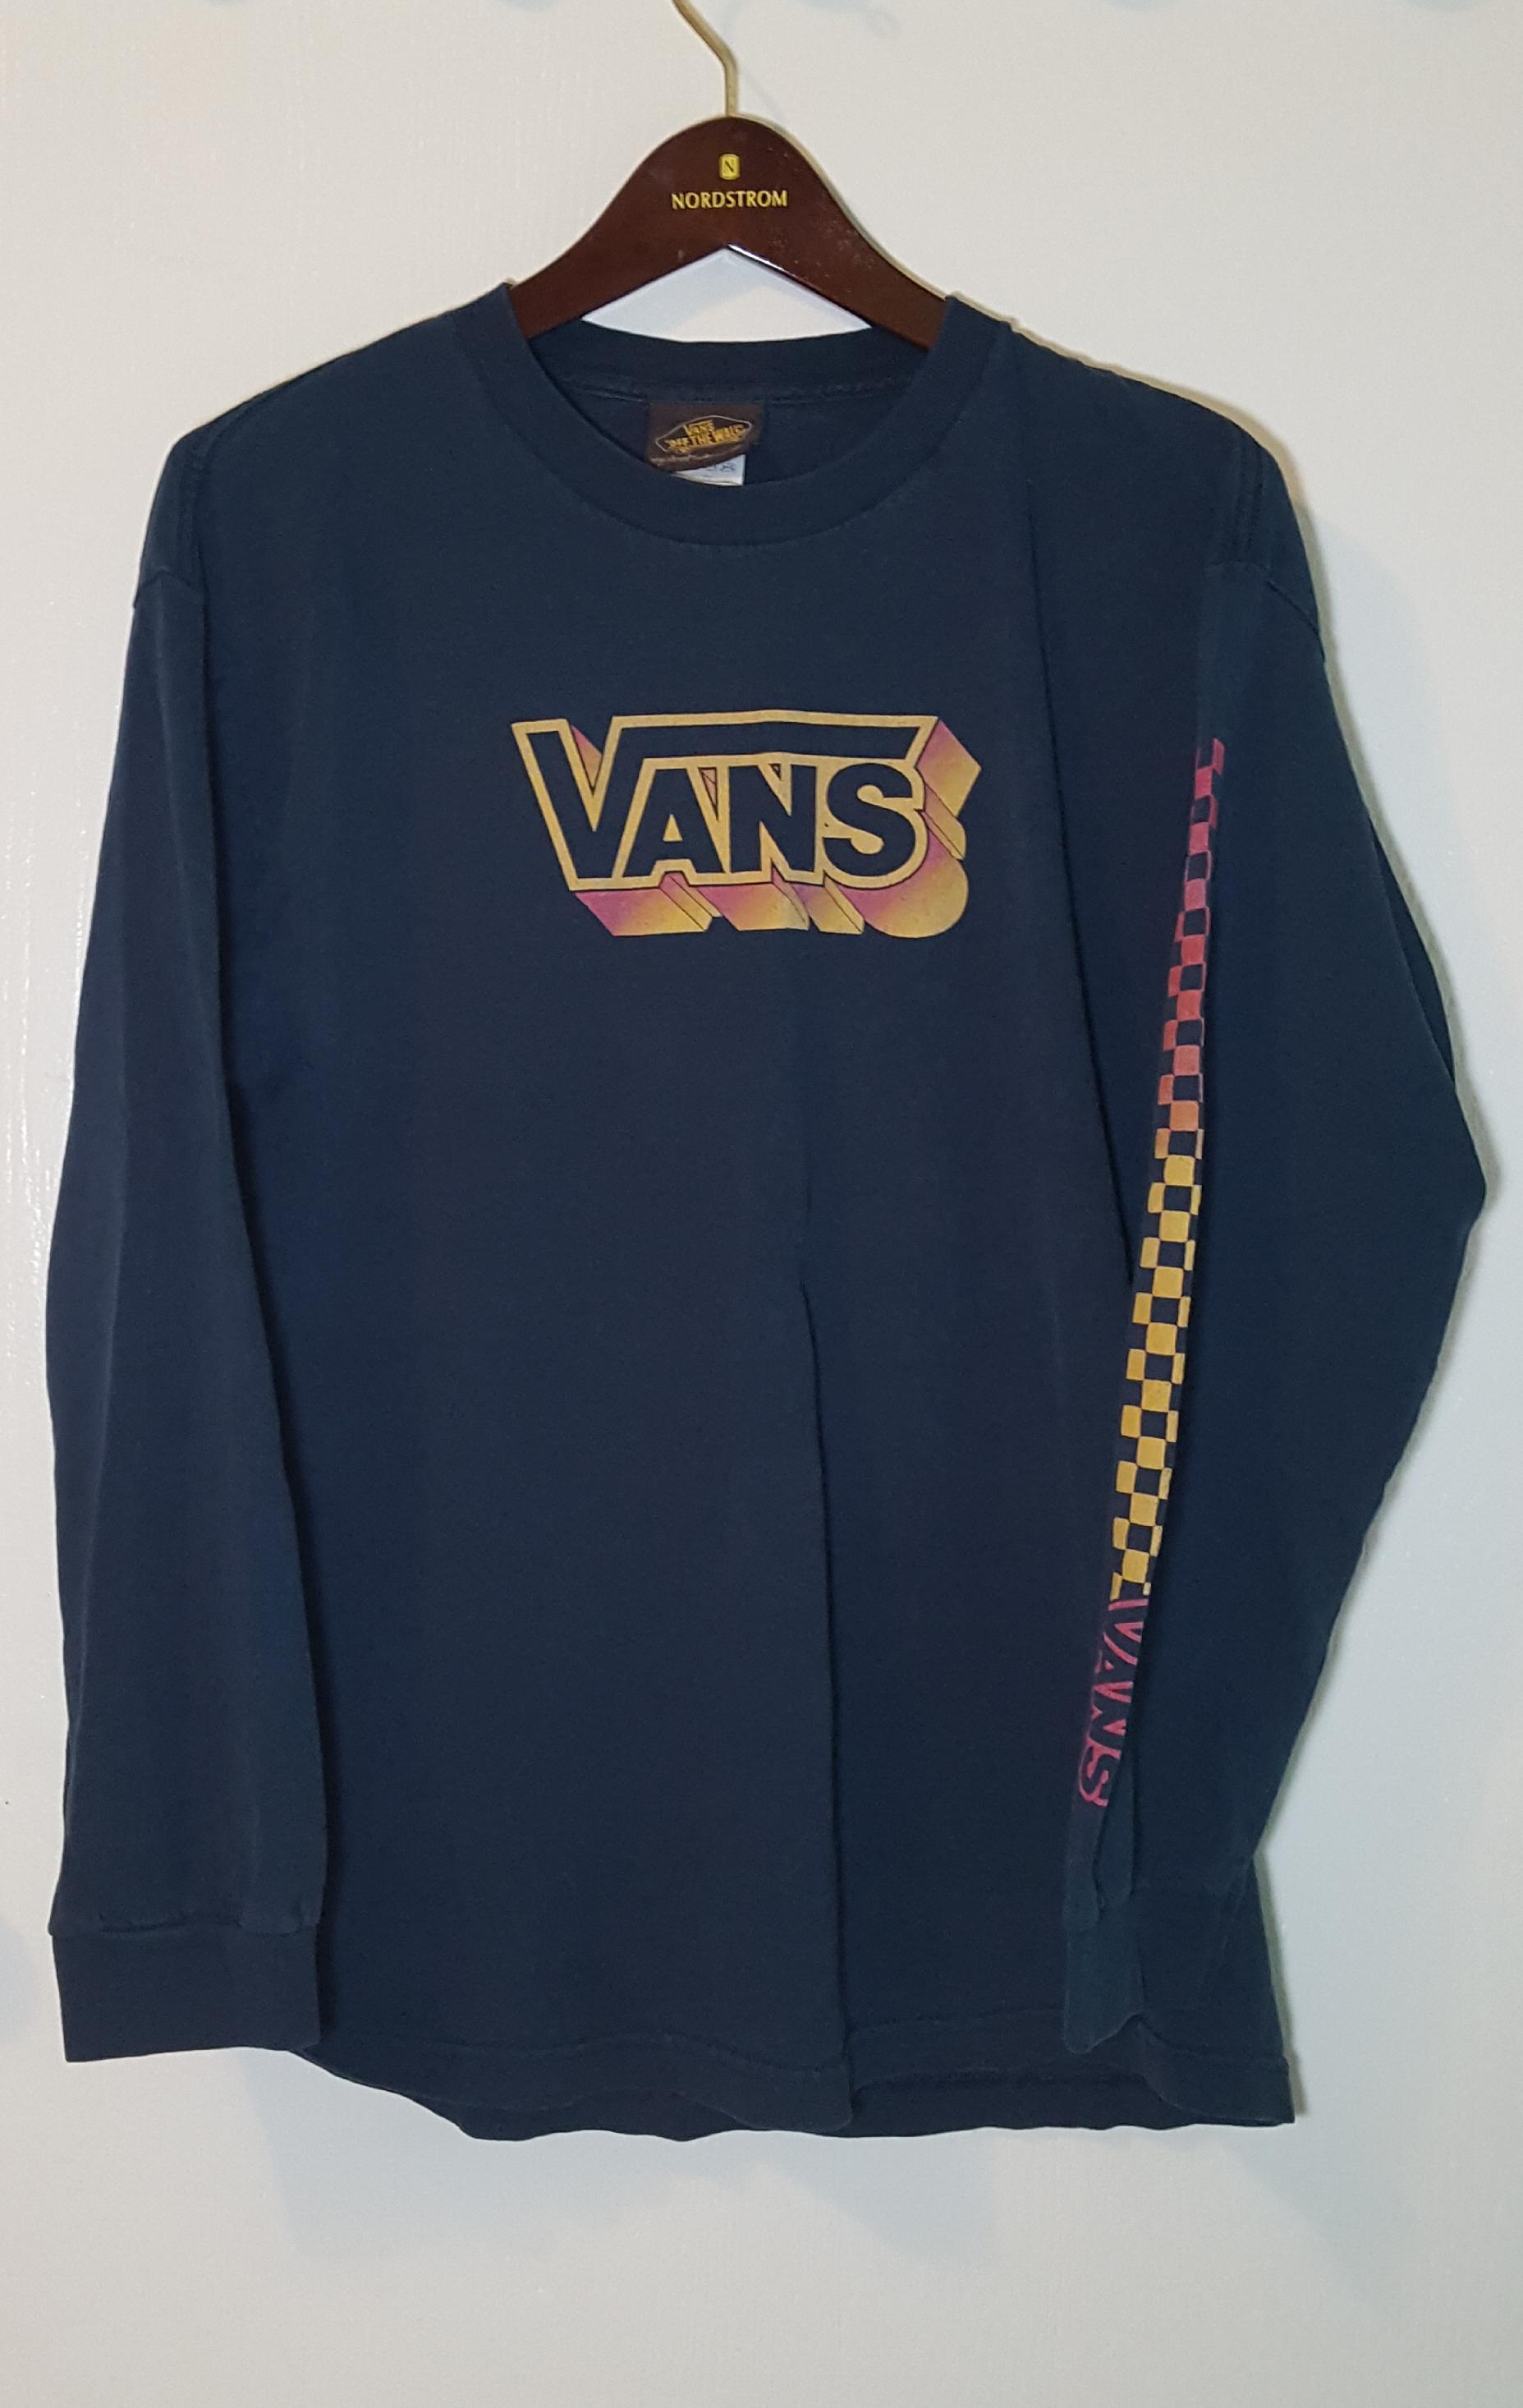 d3f2bc58b131 Vans Vintage VANS Checkerboard Long Sleeve T shirt Mens Sz L Size l - Long  Sleeve T-Shirts for Sale - Grailed